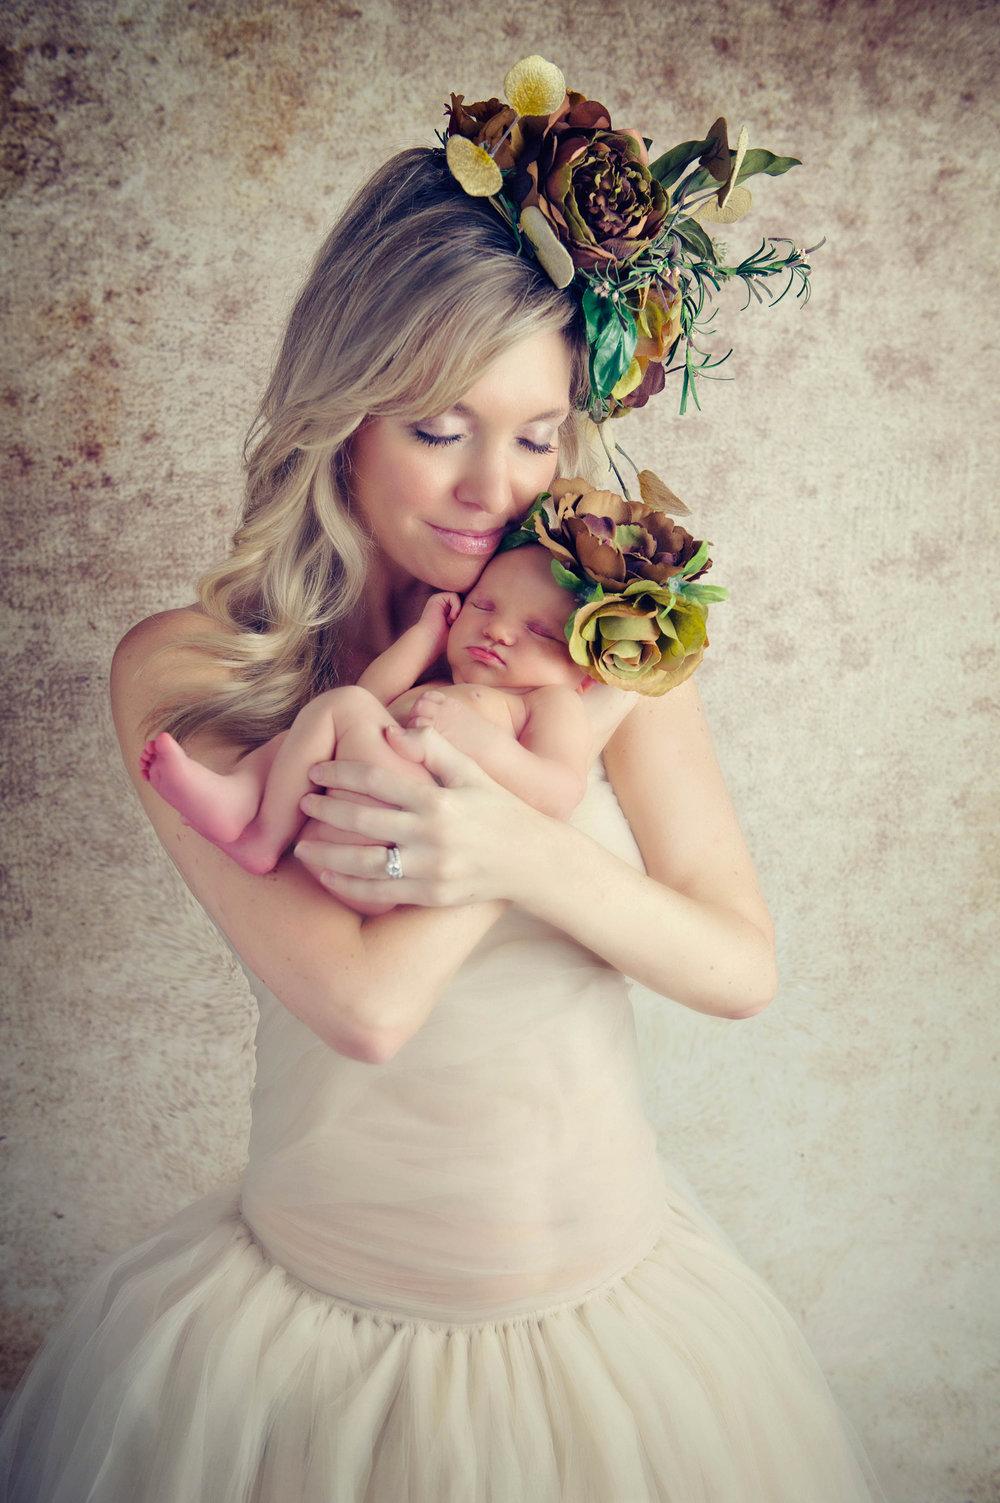 Maternitybabies_29.jpg